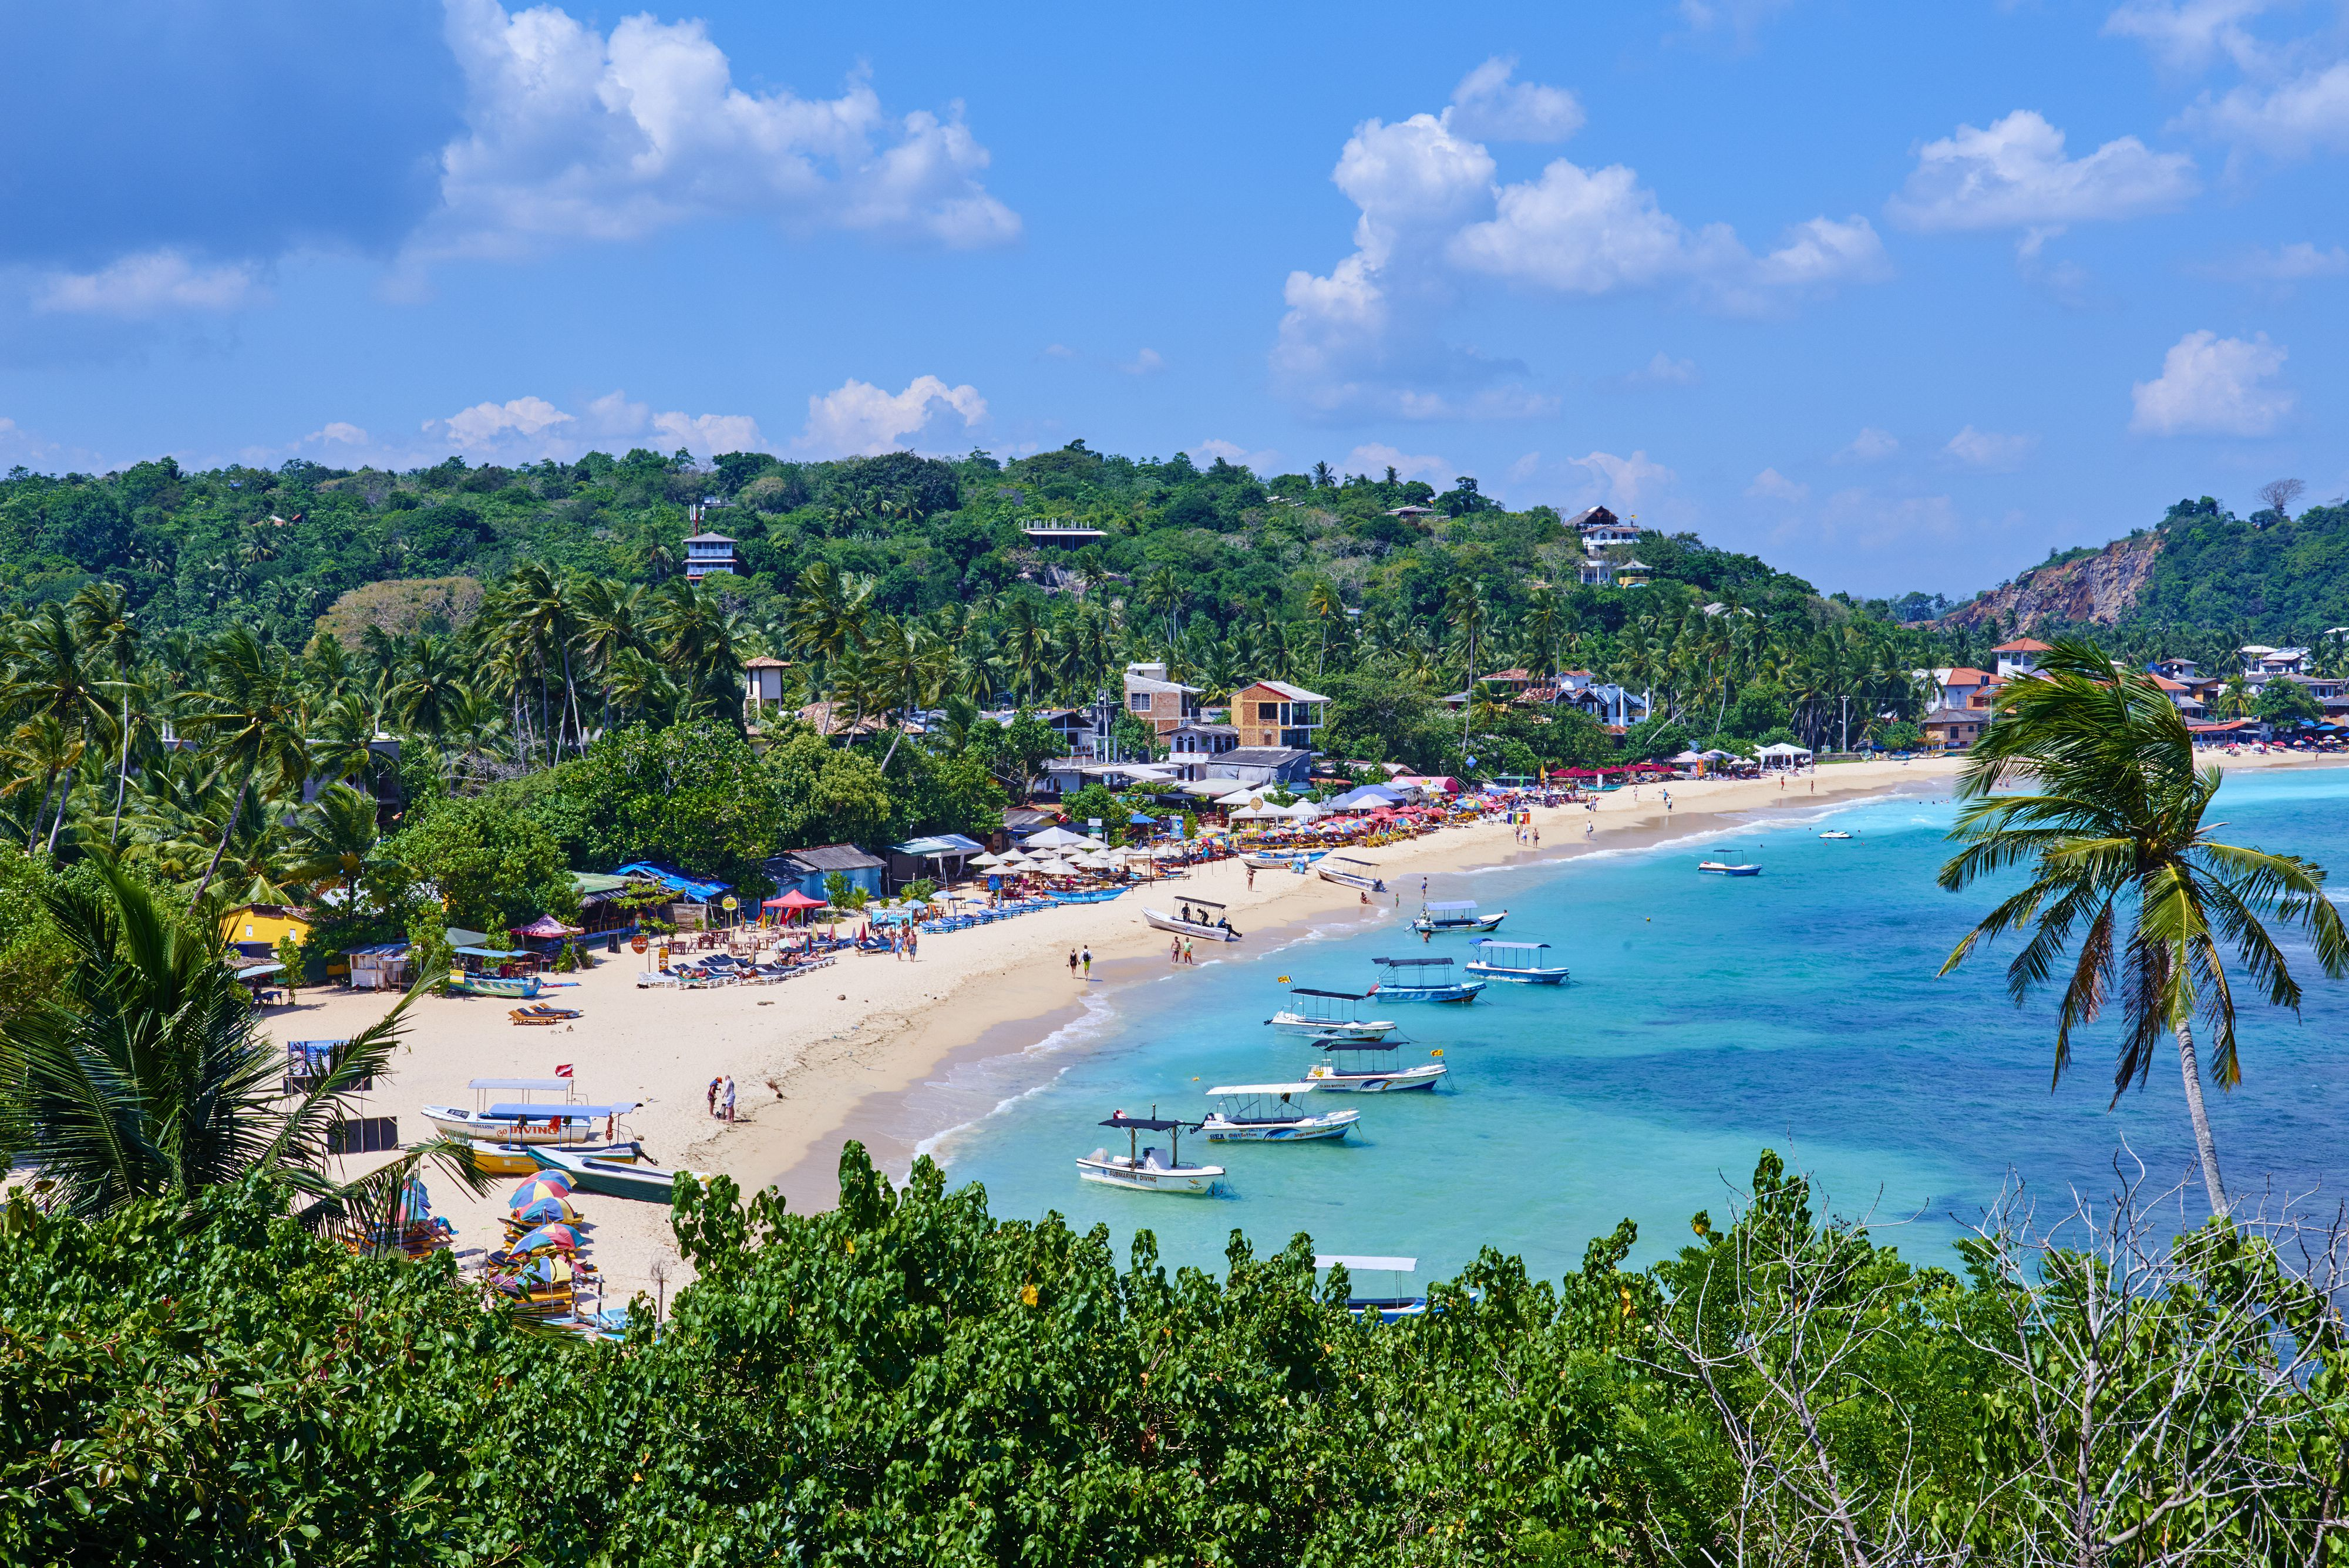 View from above of Unawatuna Beach at Sri Lanka